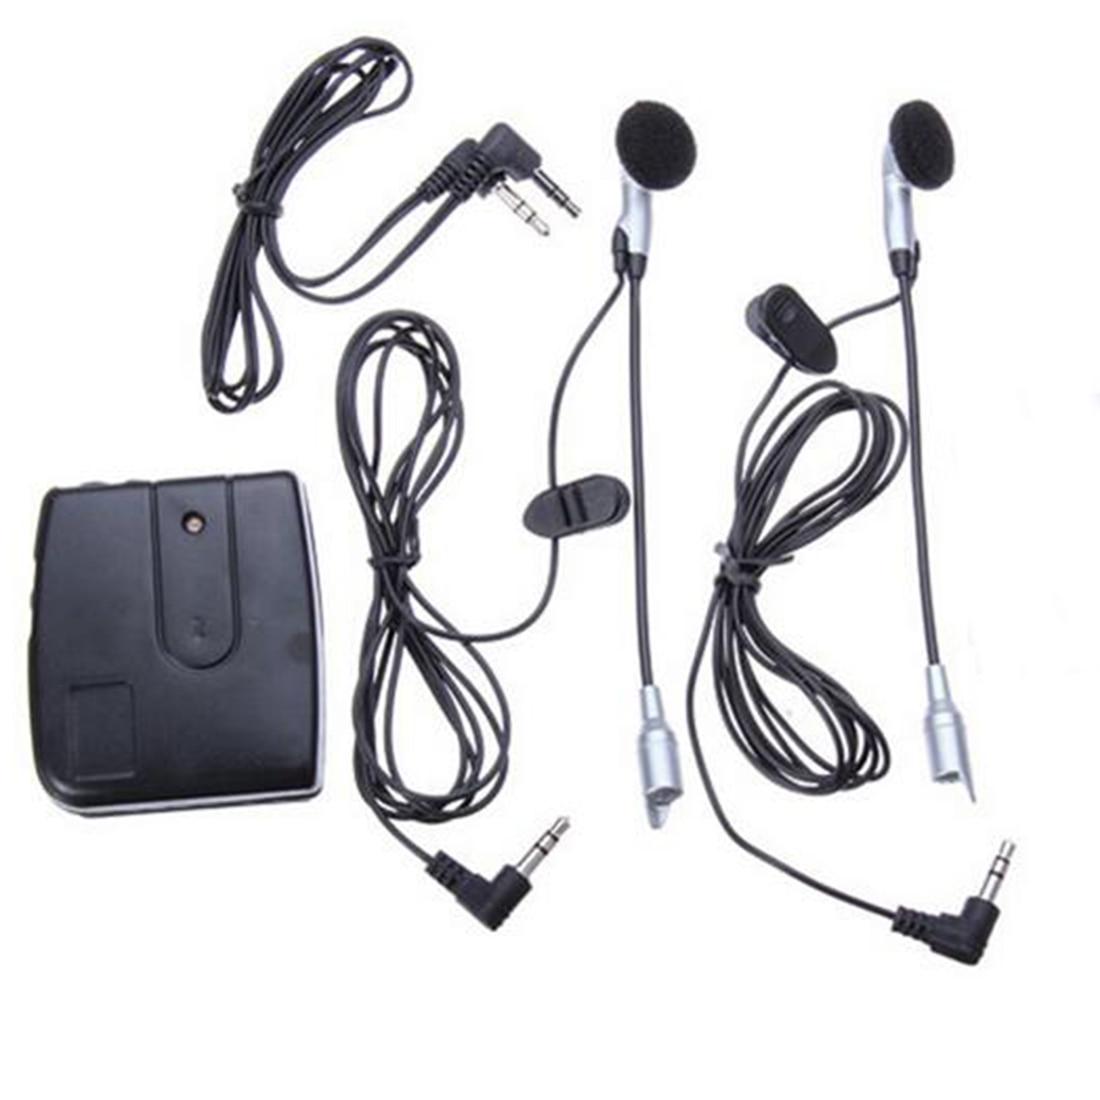 2 Way Motorbike Intercom Motorcycle Helmet Headset Communication System Interphone Motor Headset  Earphone